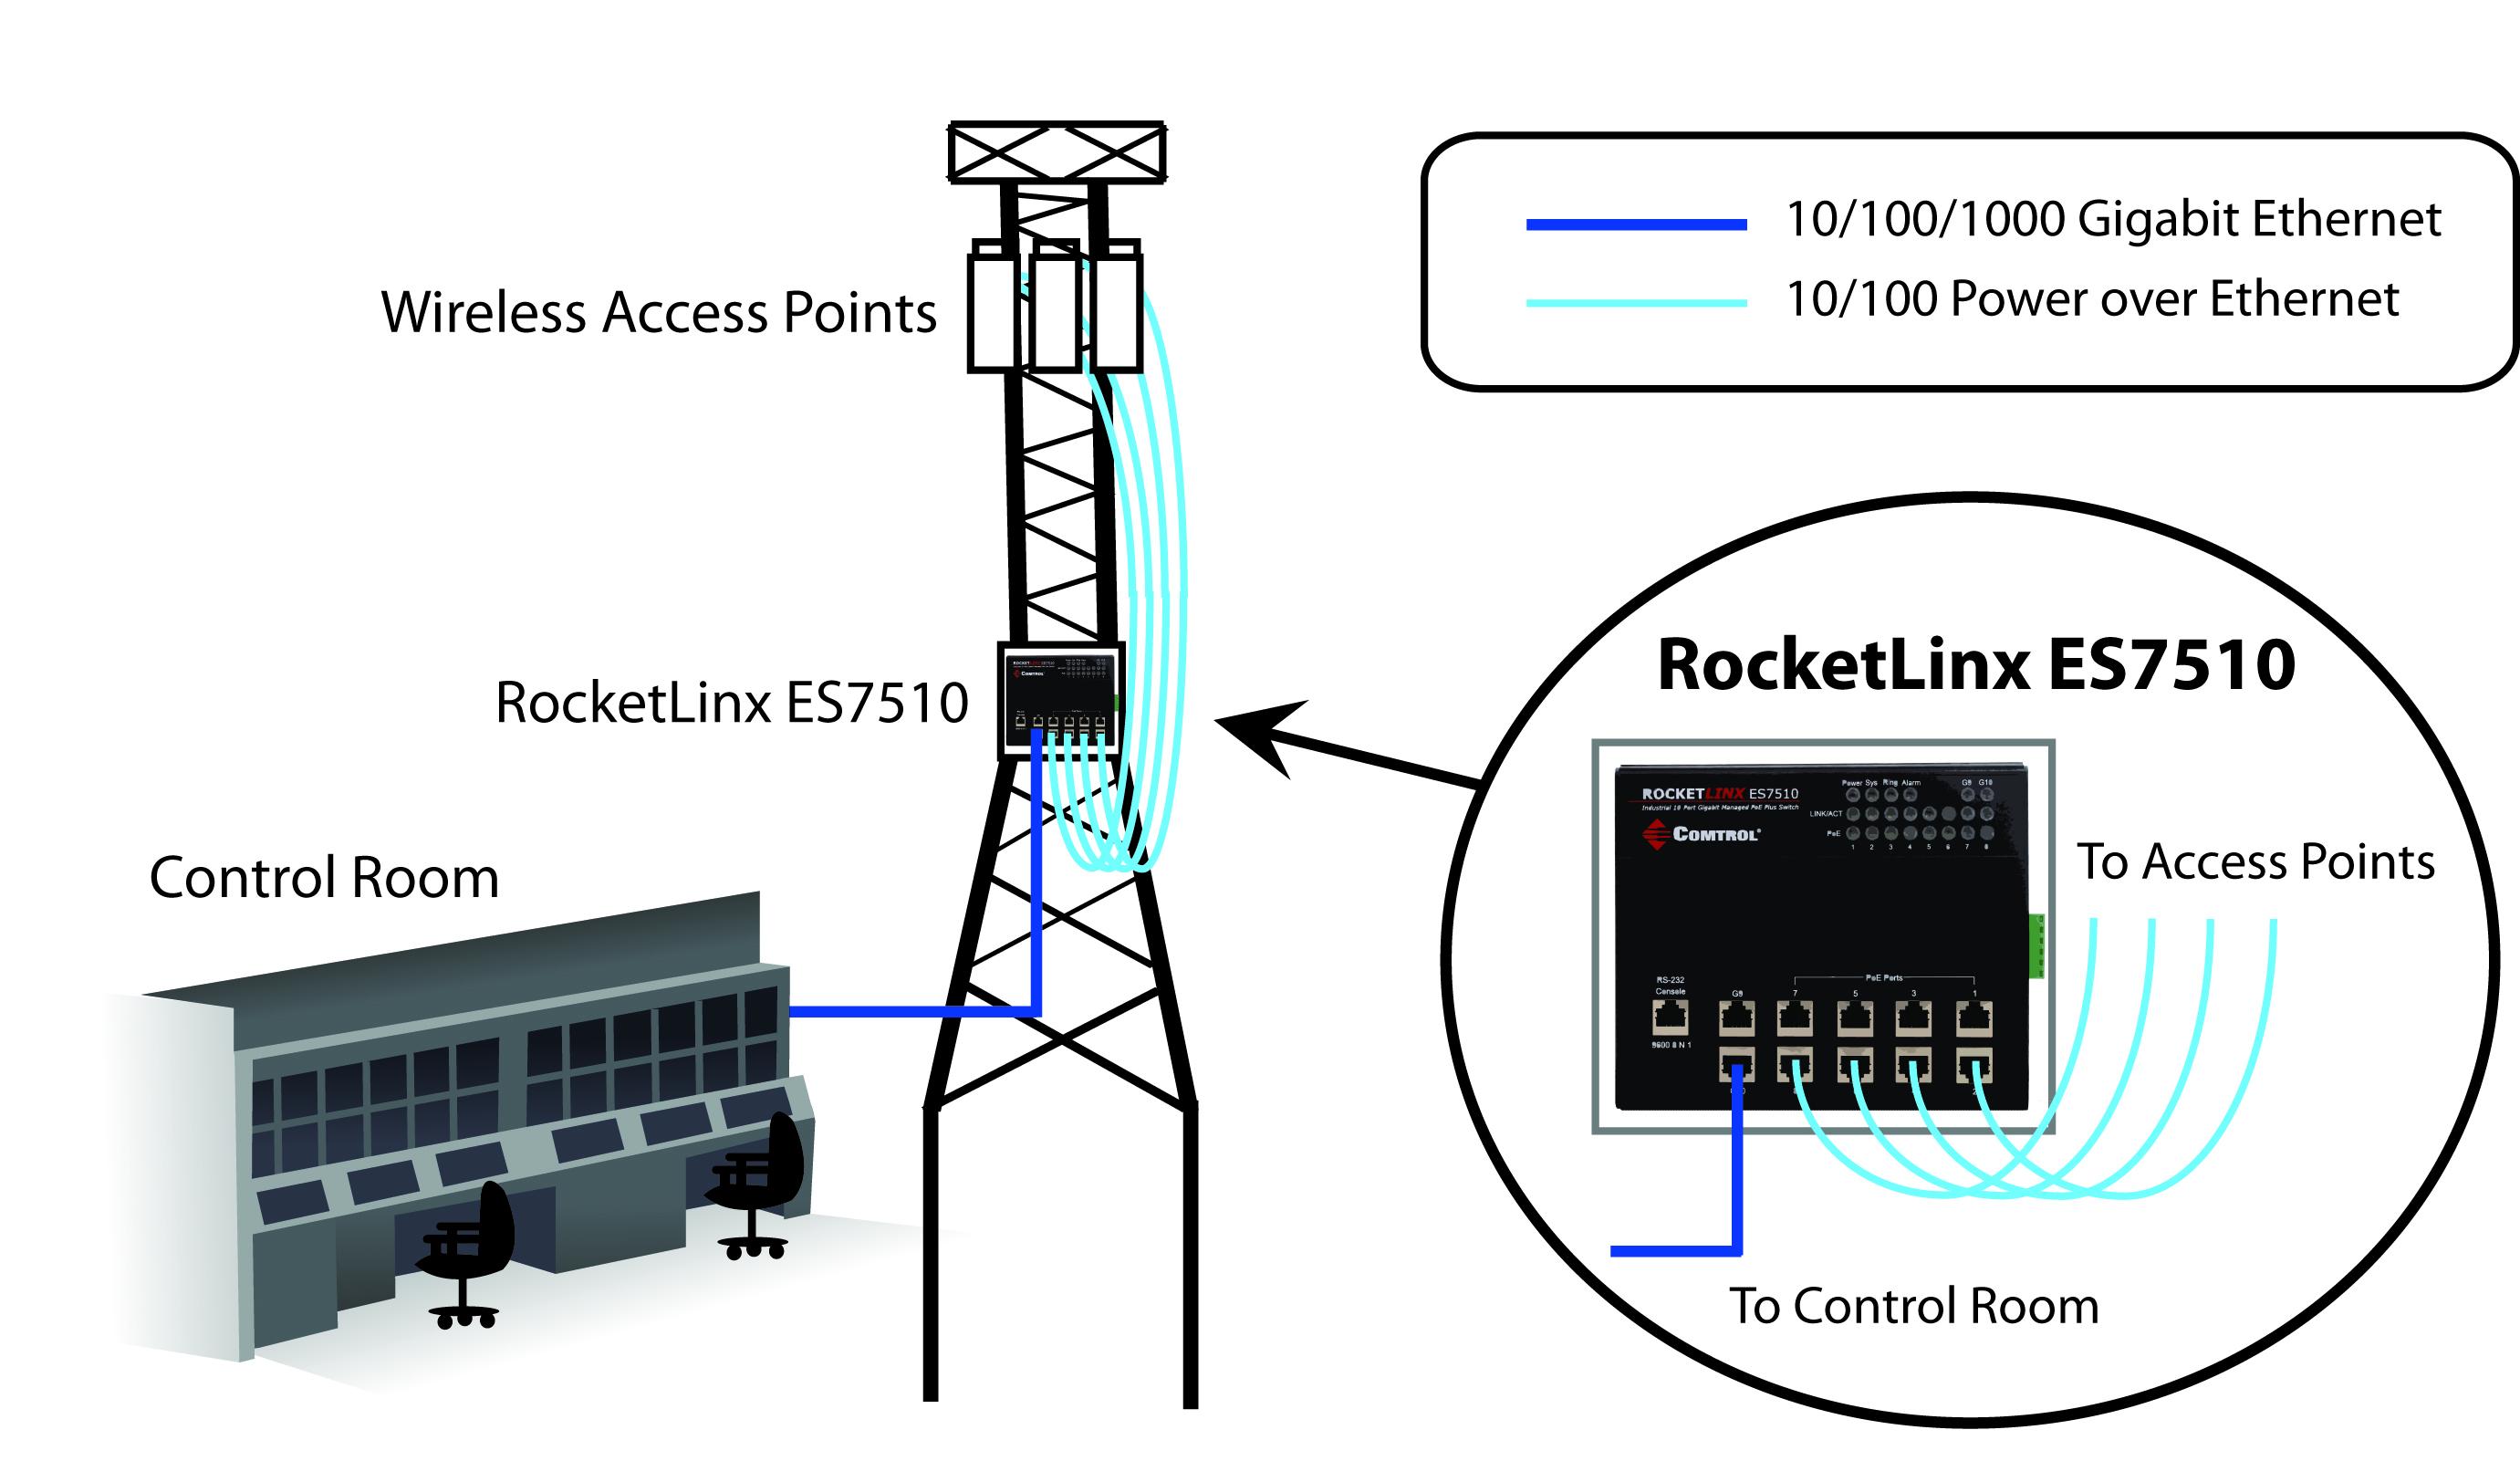 WISP RocketLinx PoE ports